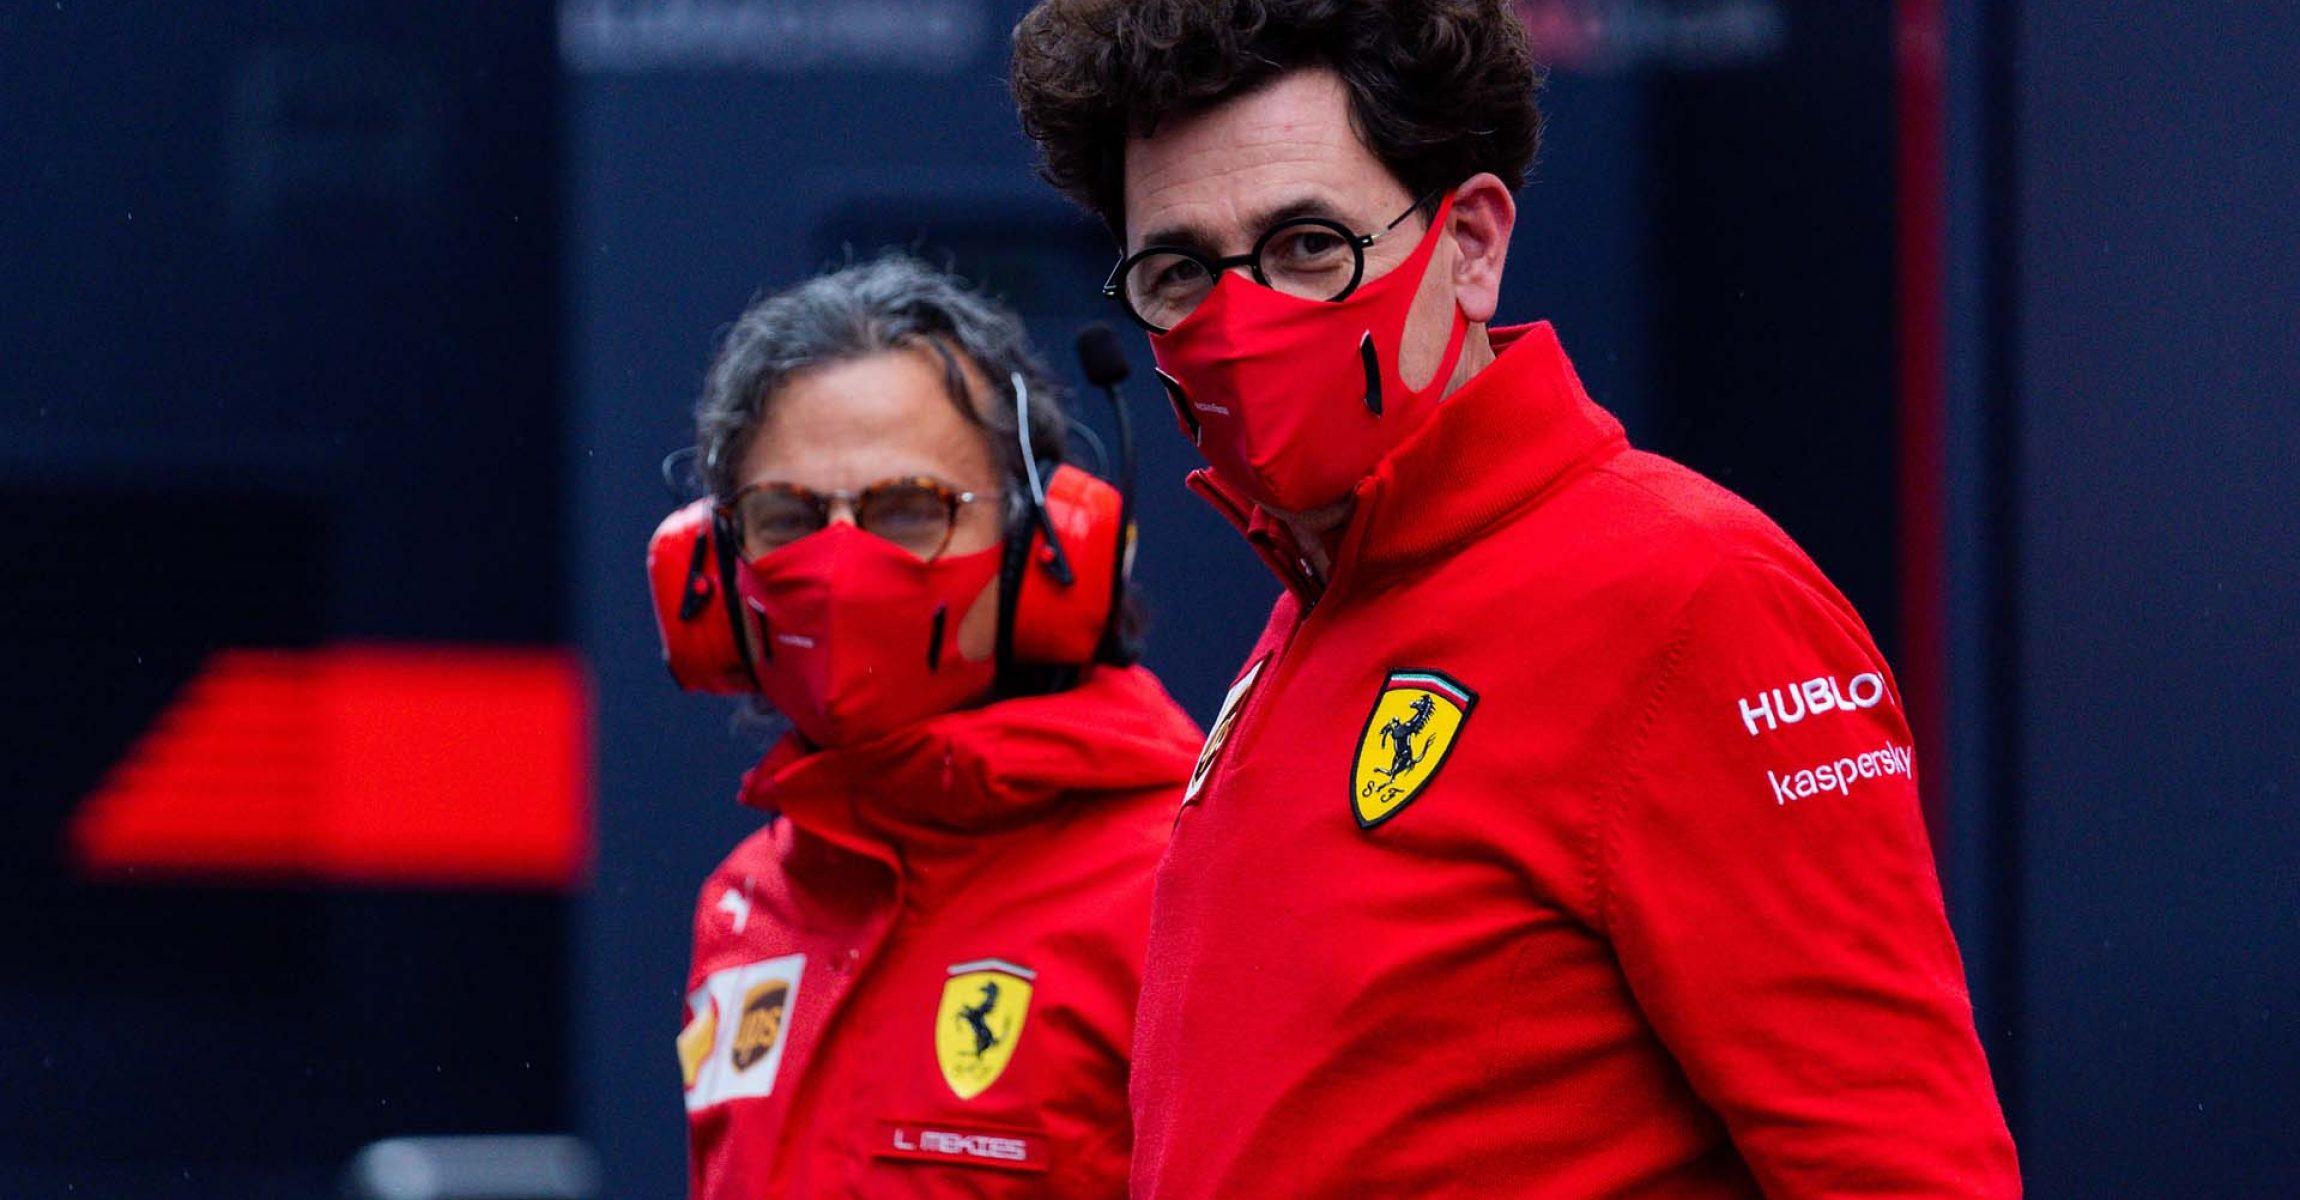 GP STYRIA F1/2020 - SABATO 11/07/2020 credit: @Scuderia Ferrari Press Office Mattia Binotto Laurent Mekies